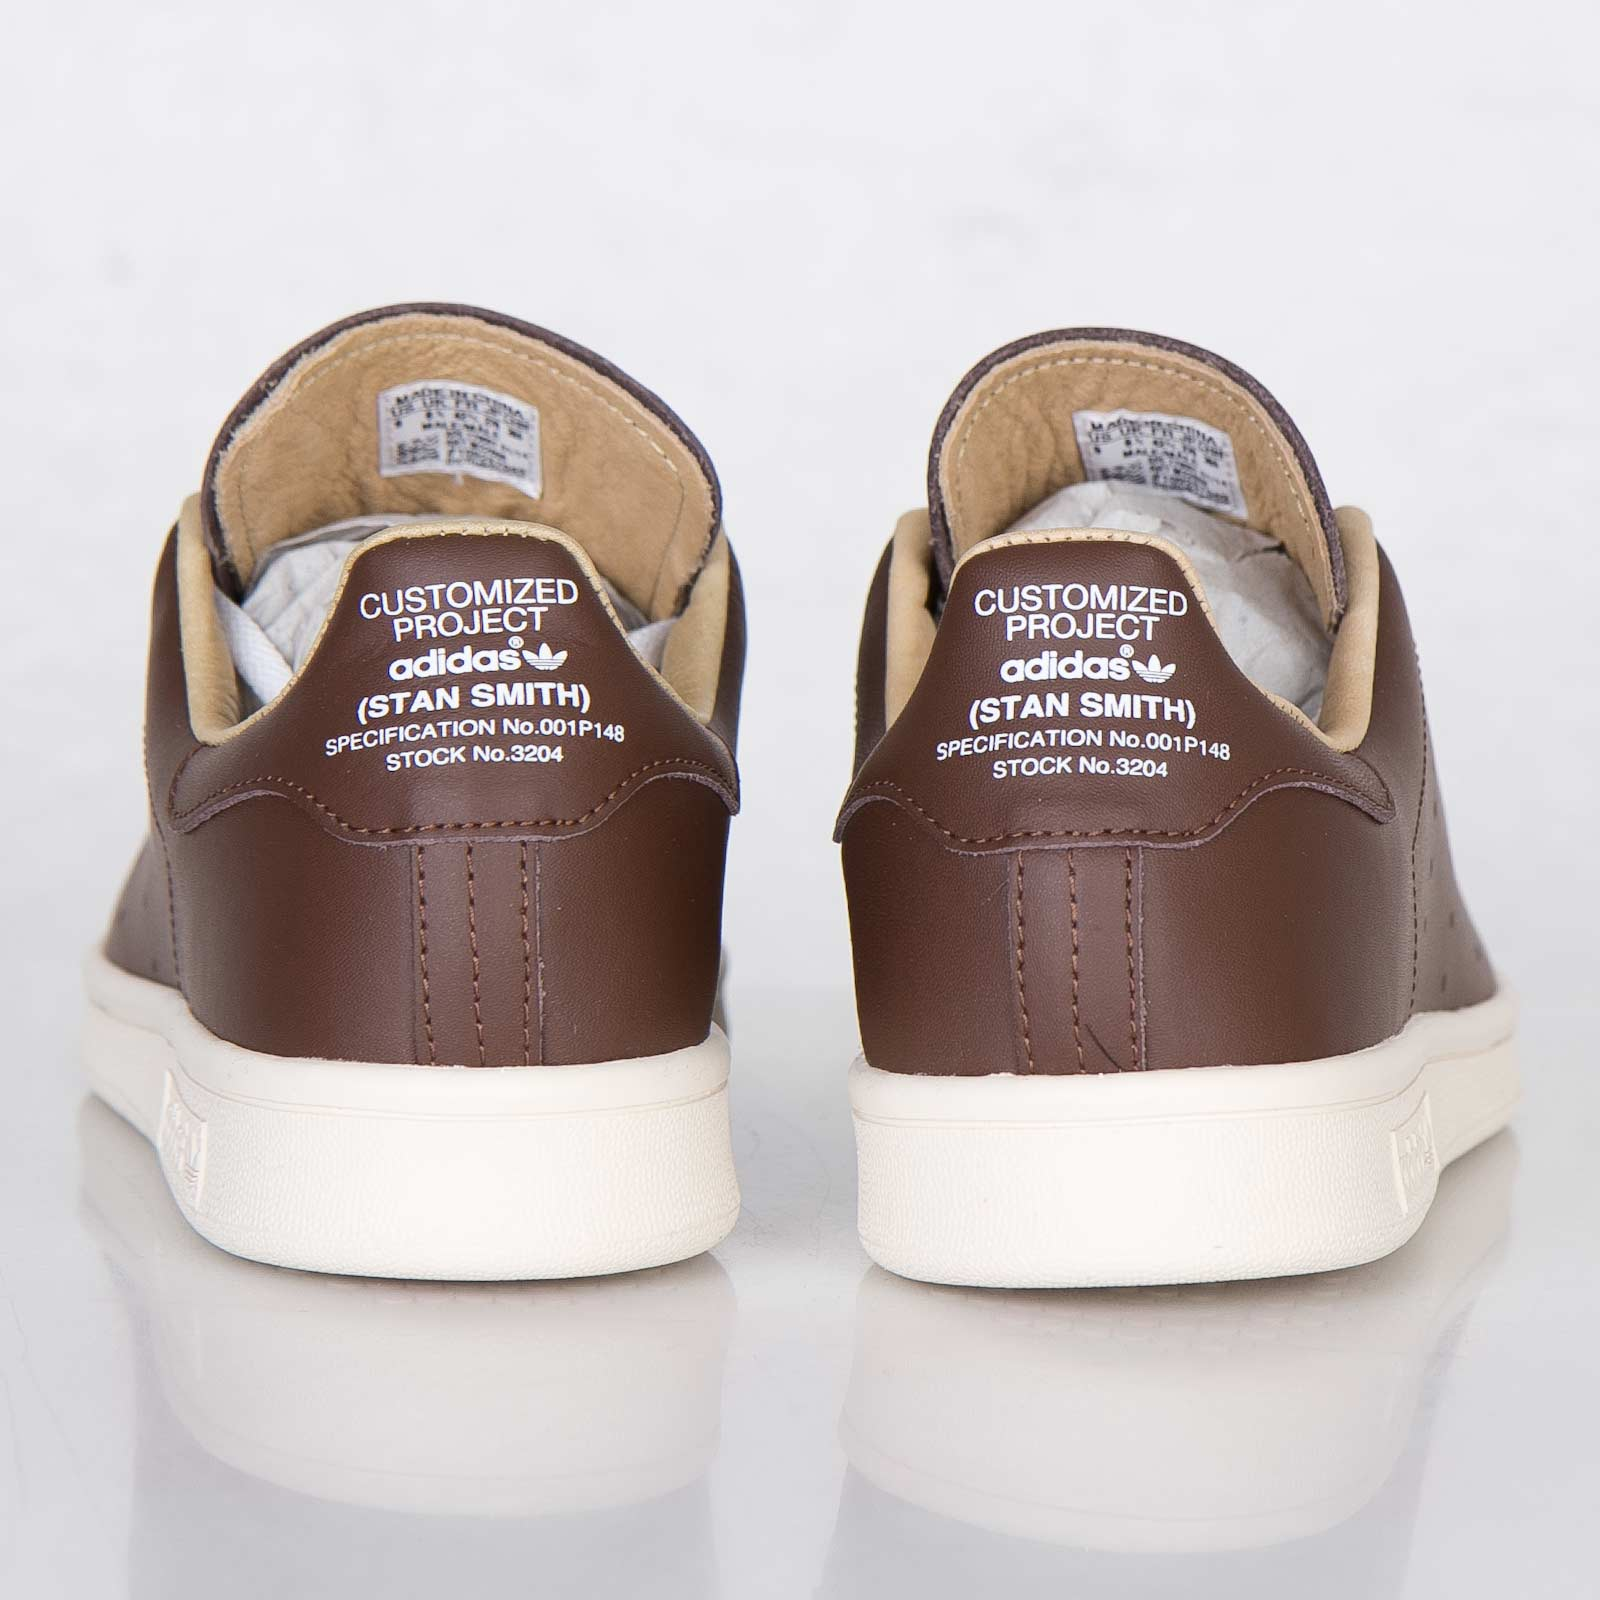 info for 5ee87 bf6db adidas Stan Smith - Neighborhood - M22698 - Sneakersnstuff ...